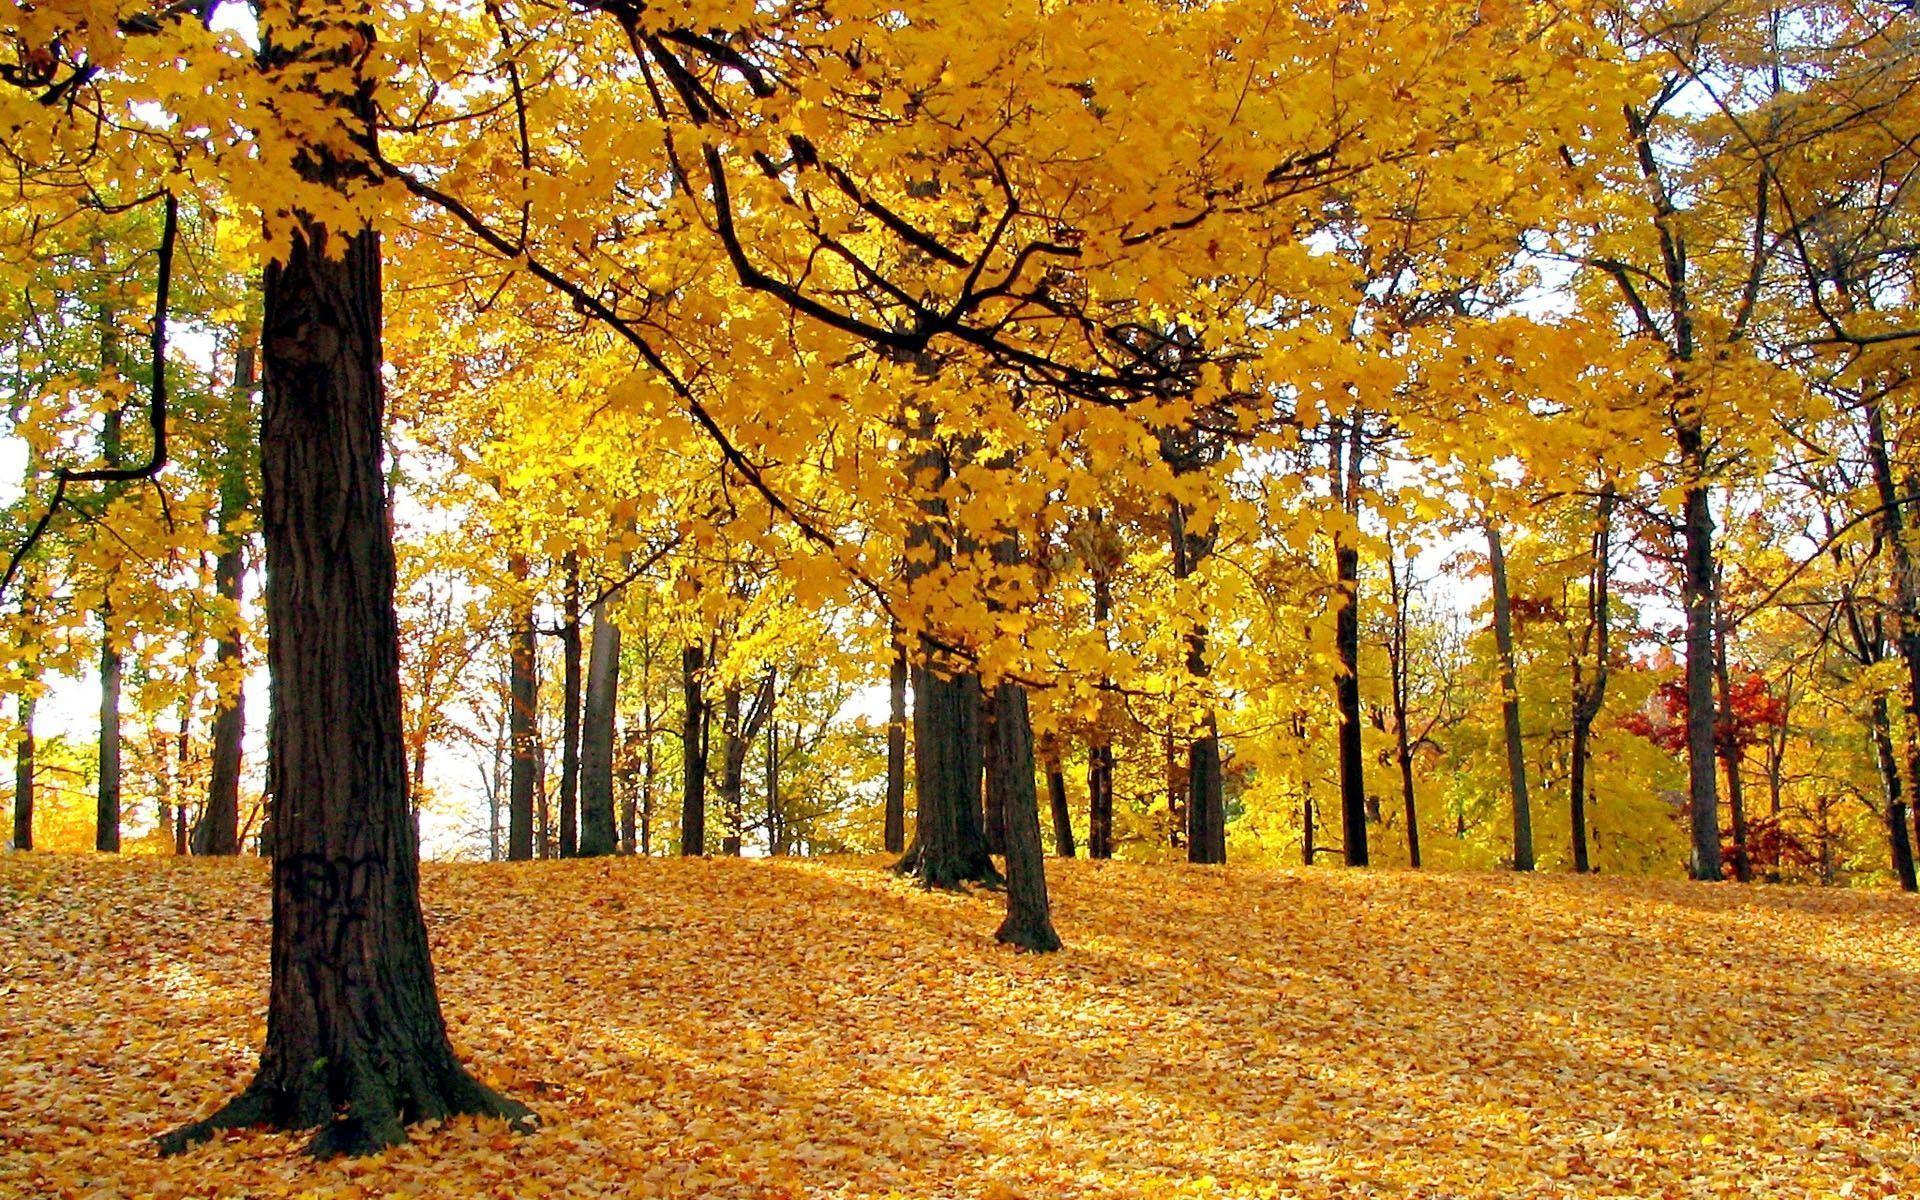 Fall Leaves Photography Wallpaper Fall Foliage Desktop W...